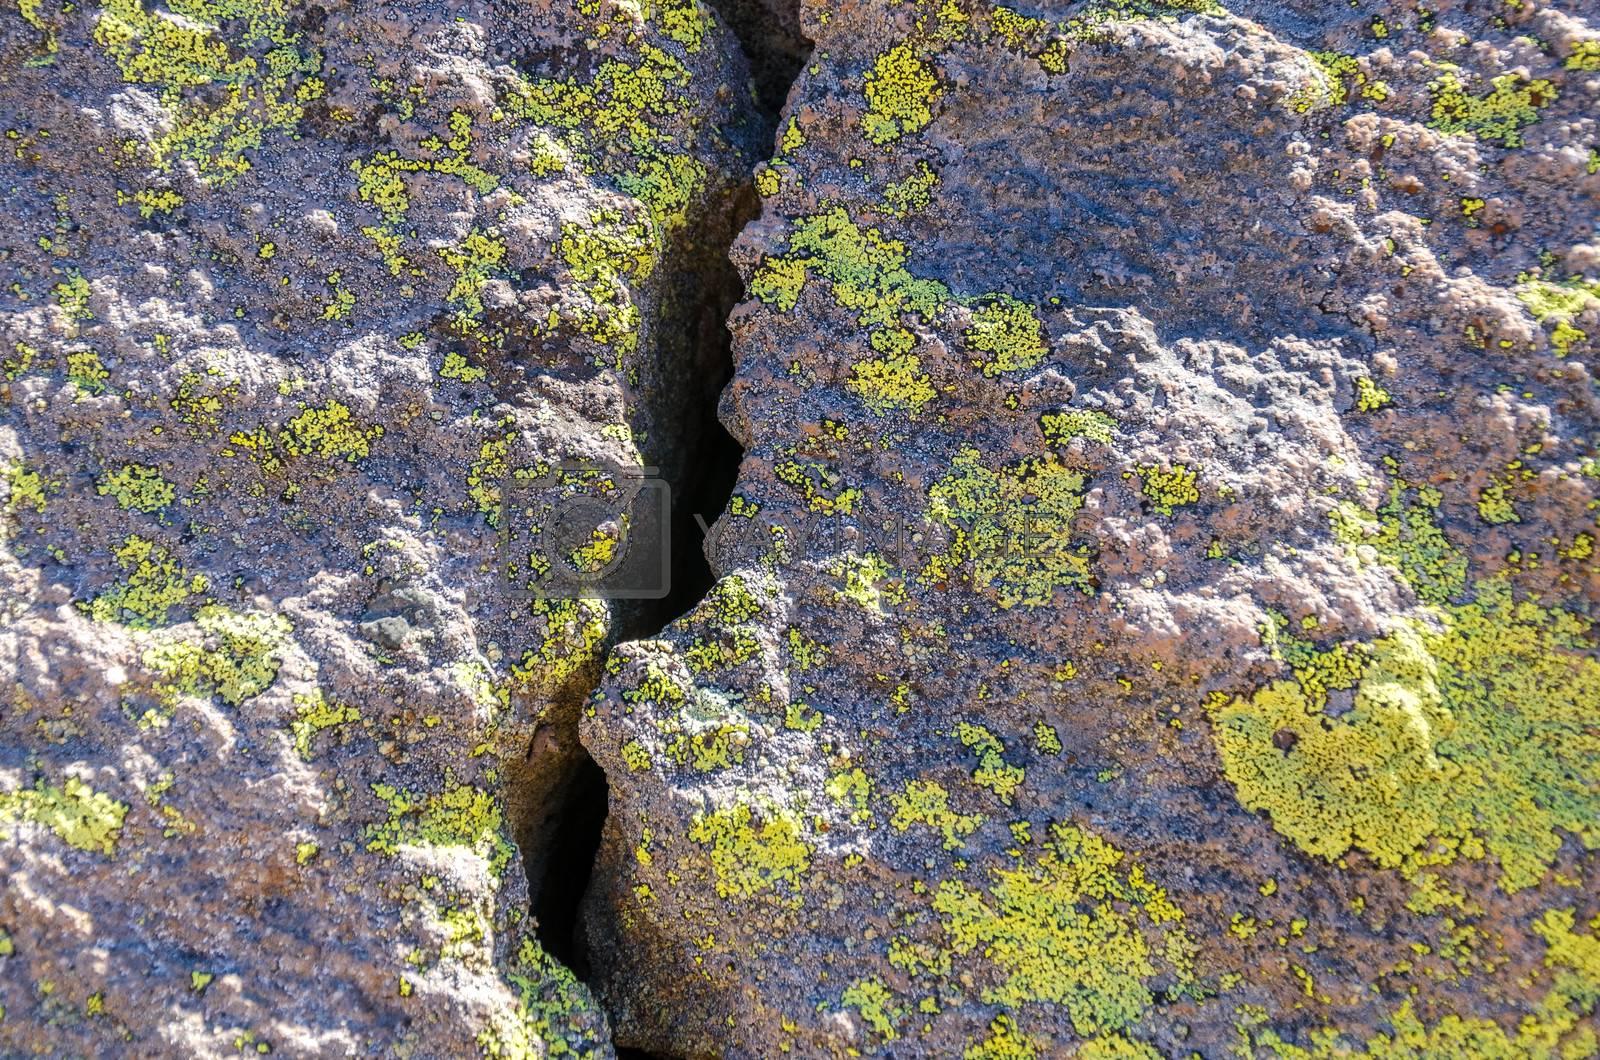 A boulder split in half and covered in greenish lichen